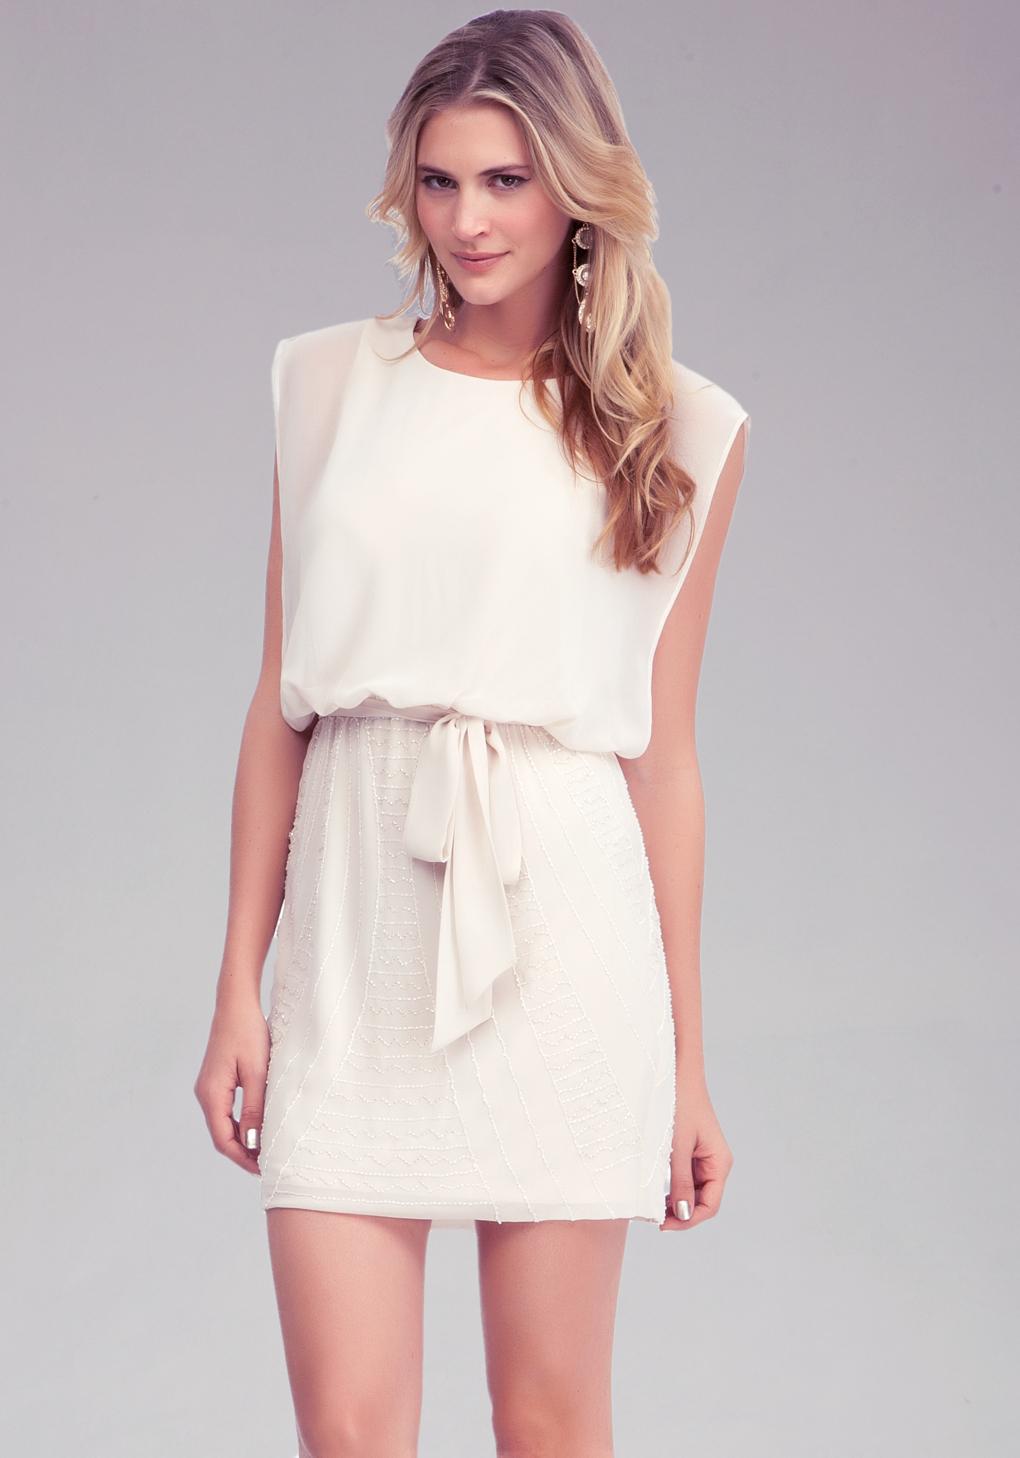 Bebe Sheer Top Beaded Skirt Dress Online Exclusive In